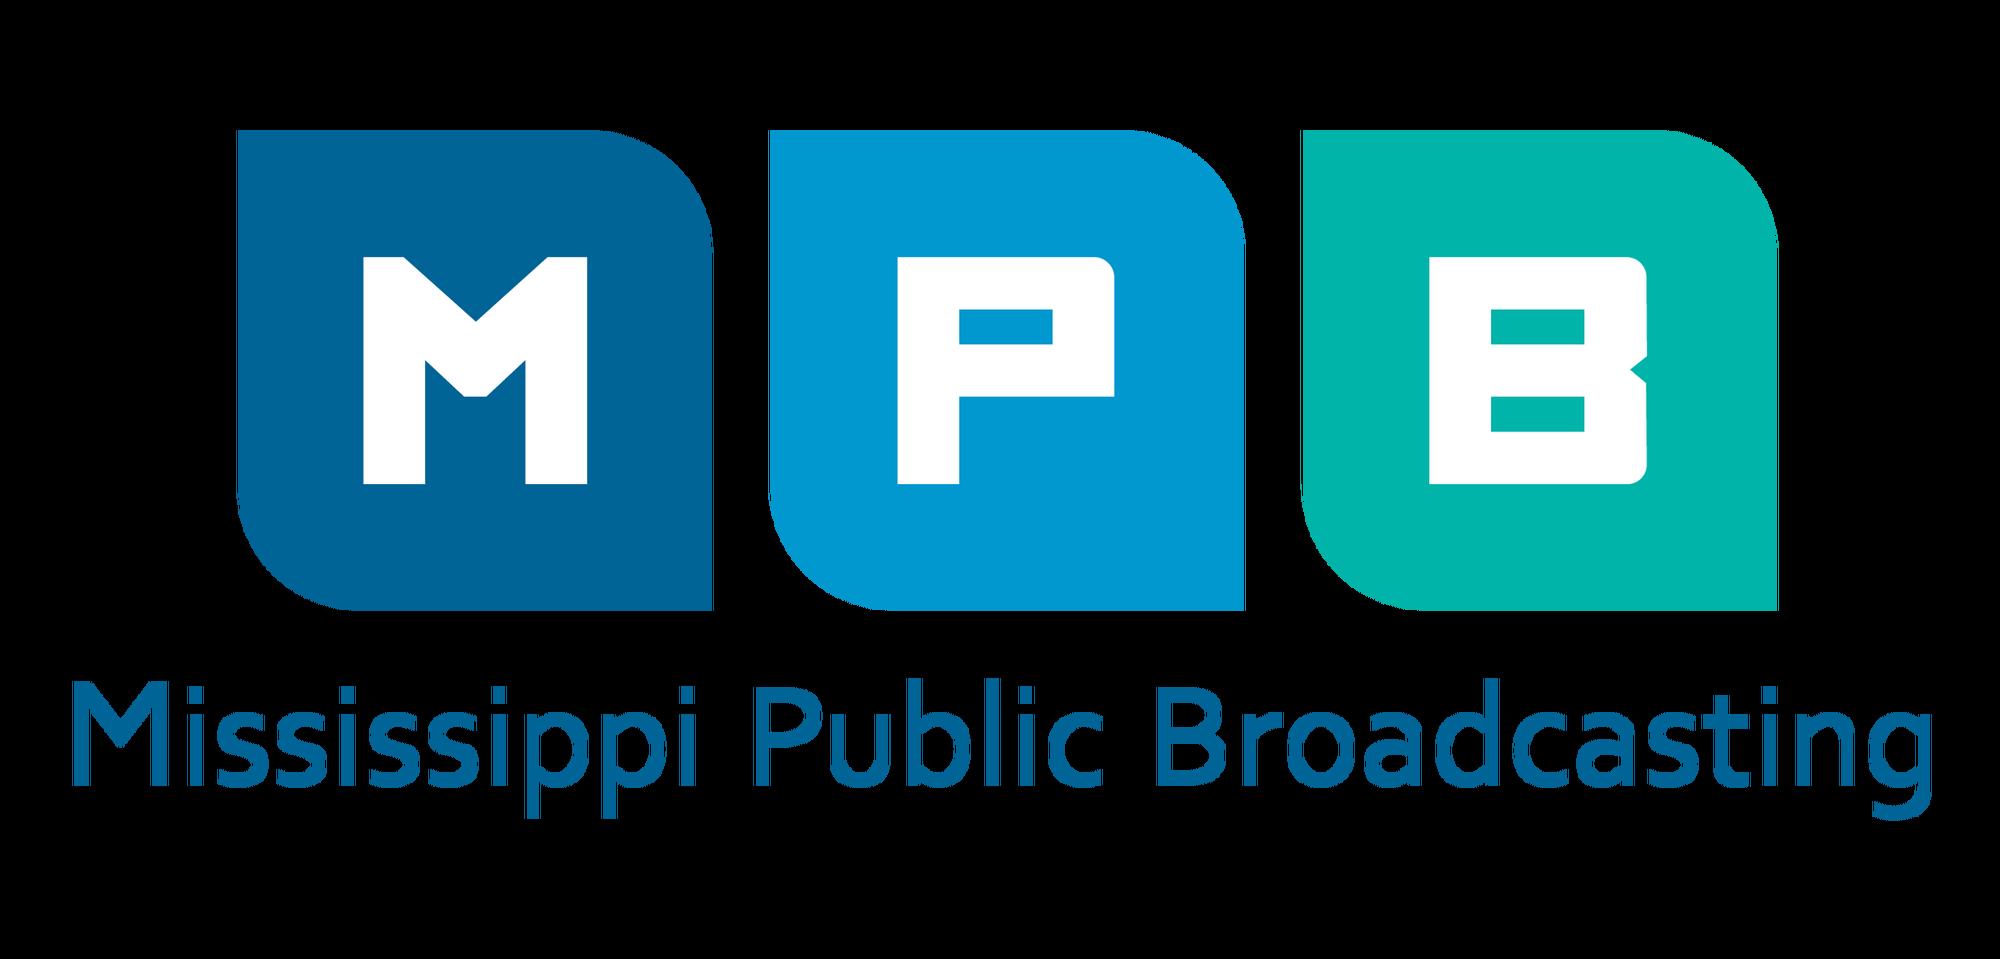 Mississippi Public Broadcasting   Logopedia   FANDOM powered by Wikia